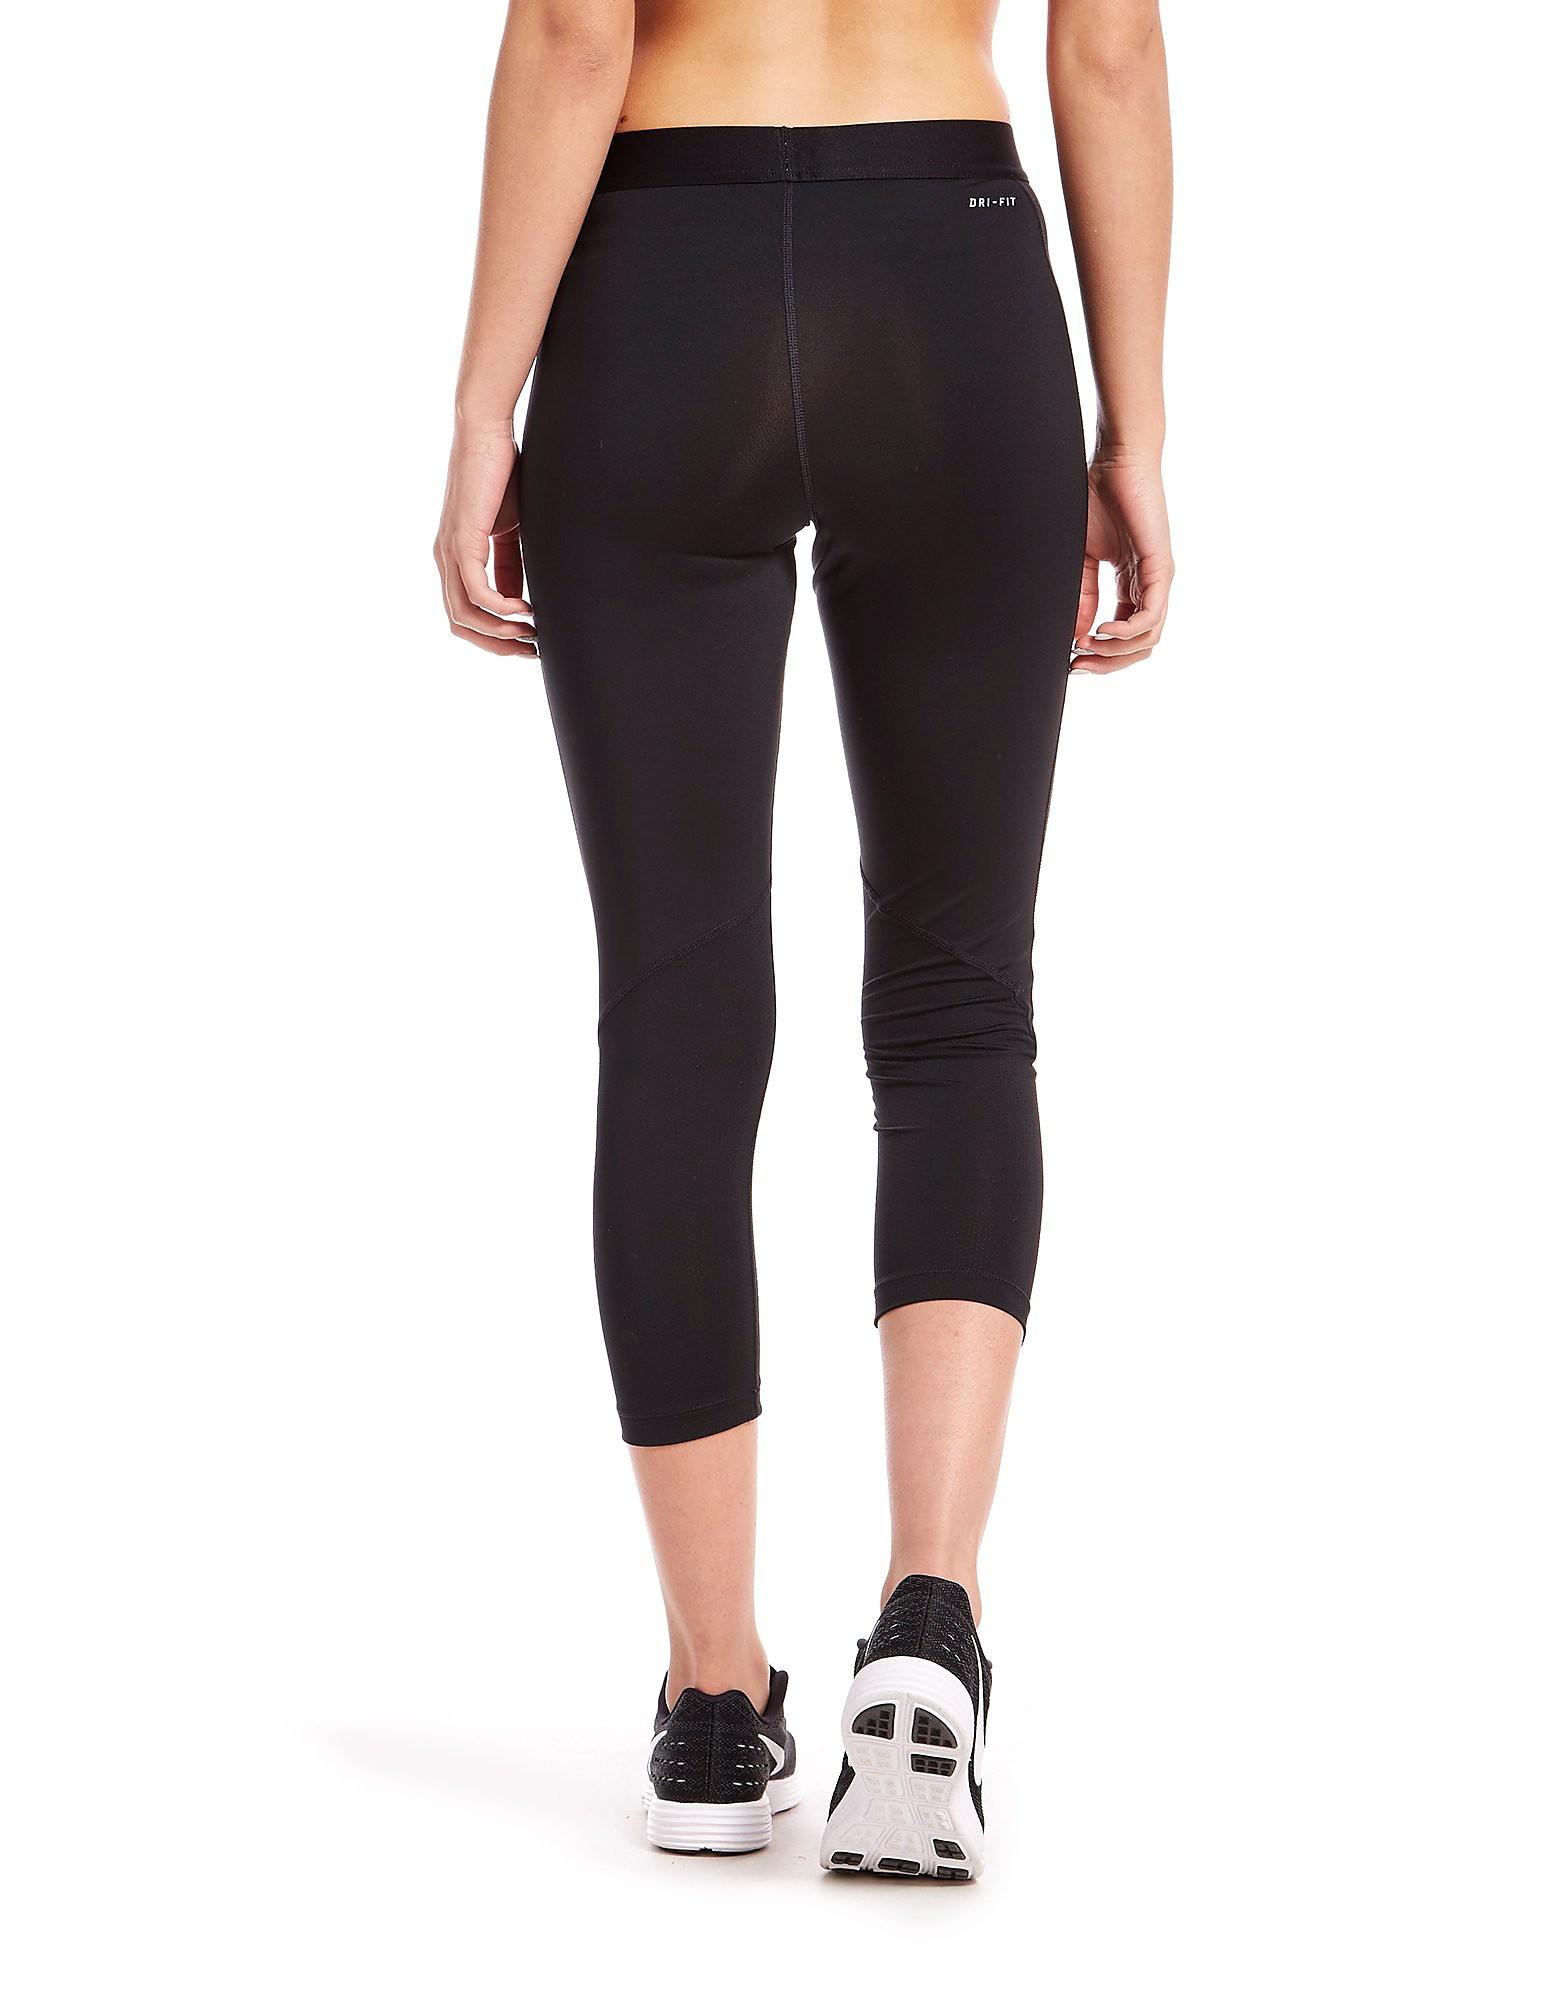 Nike Legging Pro